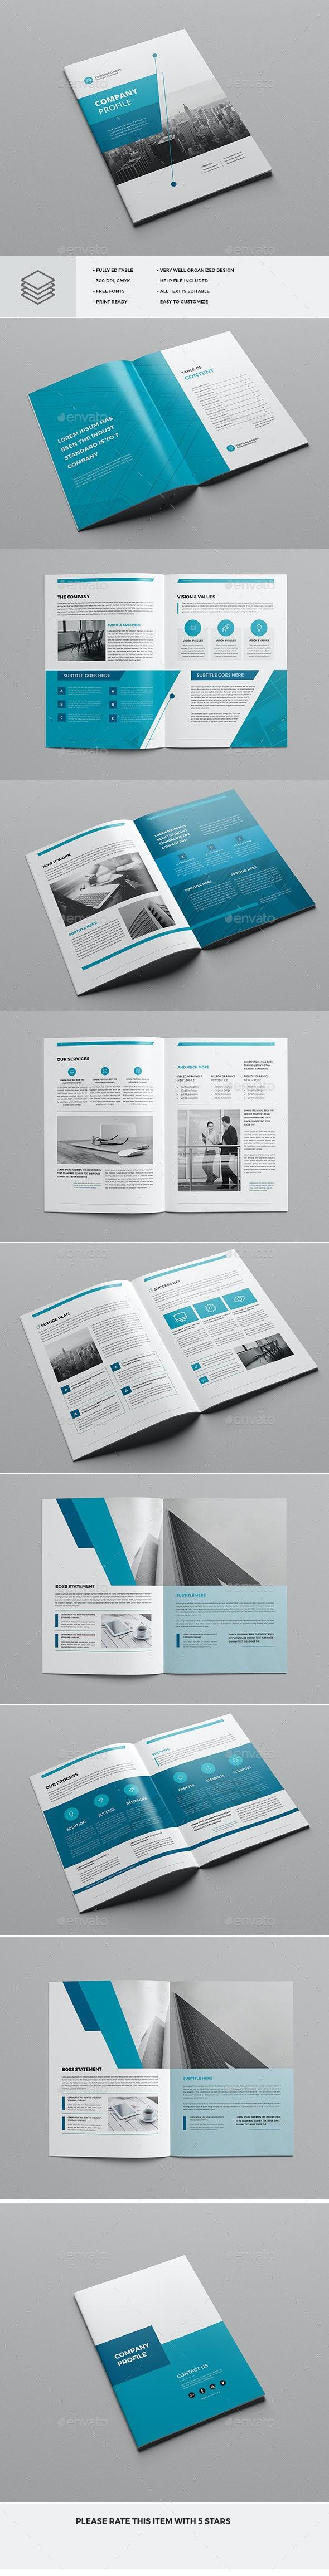 Corporate Business Brochure 01 - Corporate Brochures